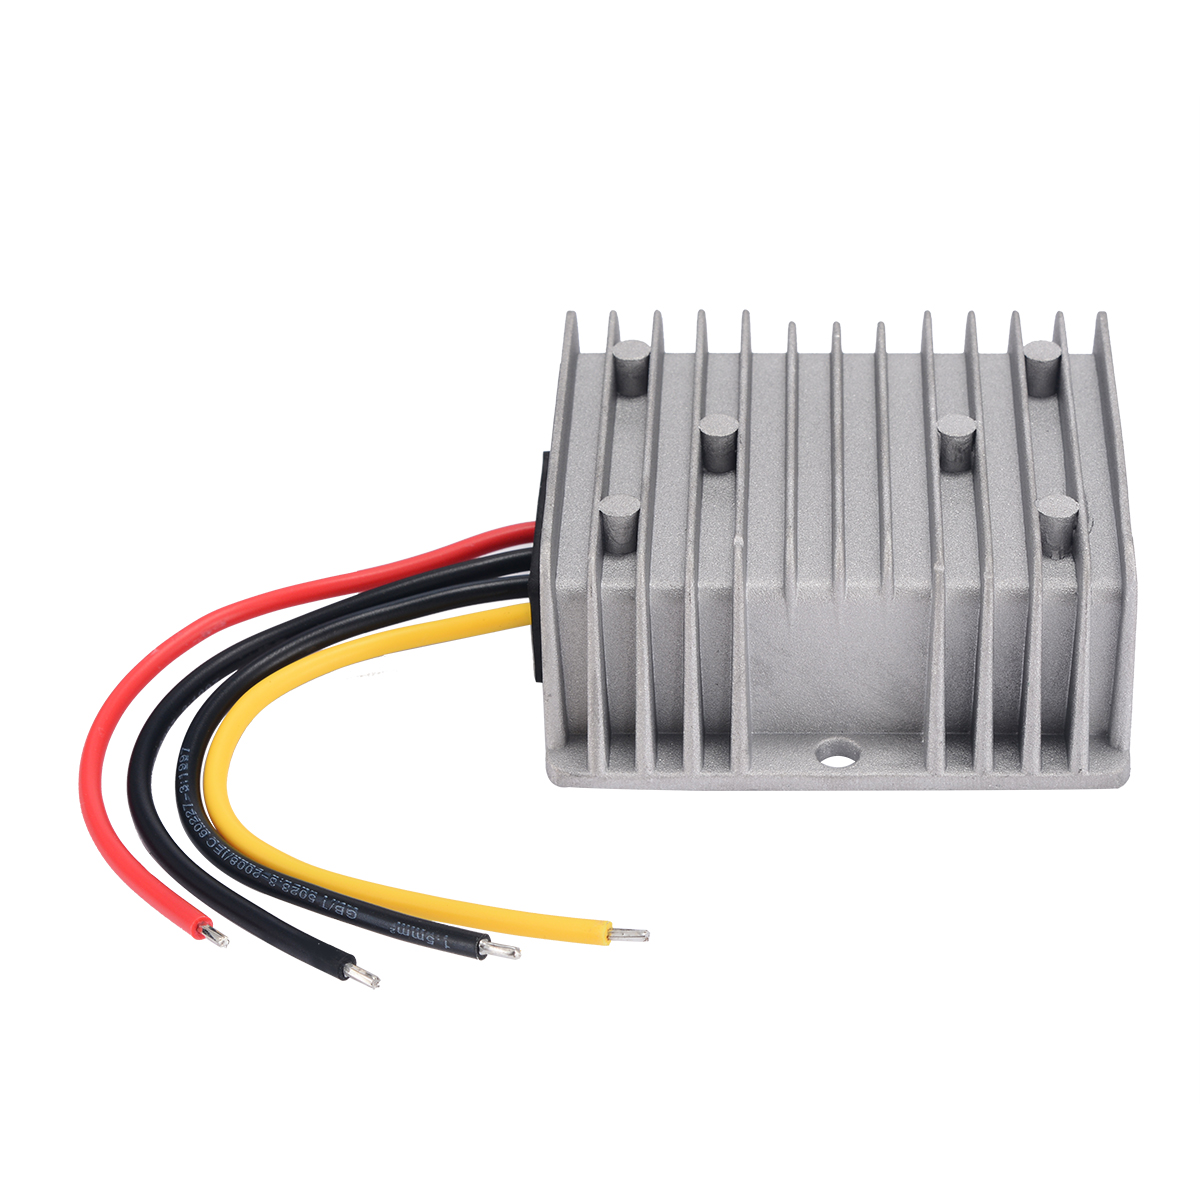 цена на Mayitr Step-Down Converter DC/DC 24V to 12V Car Power Supply Module Regulator 20A 240W Durable Converter